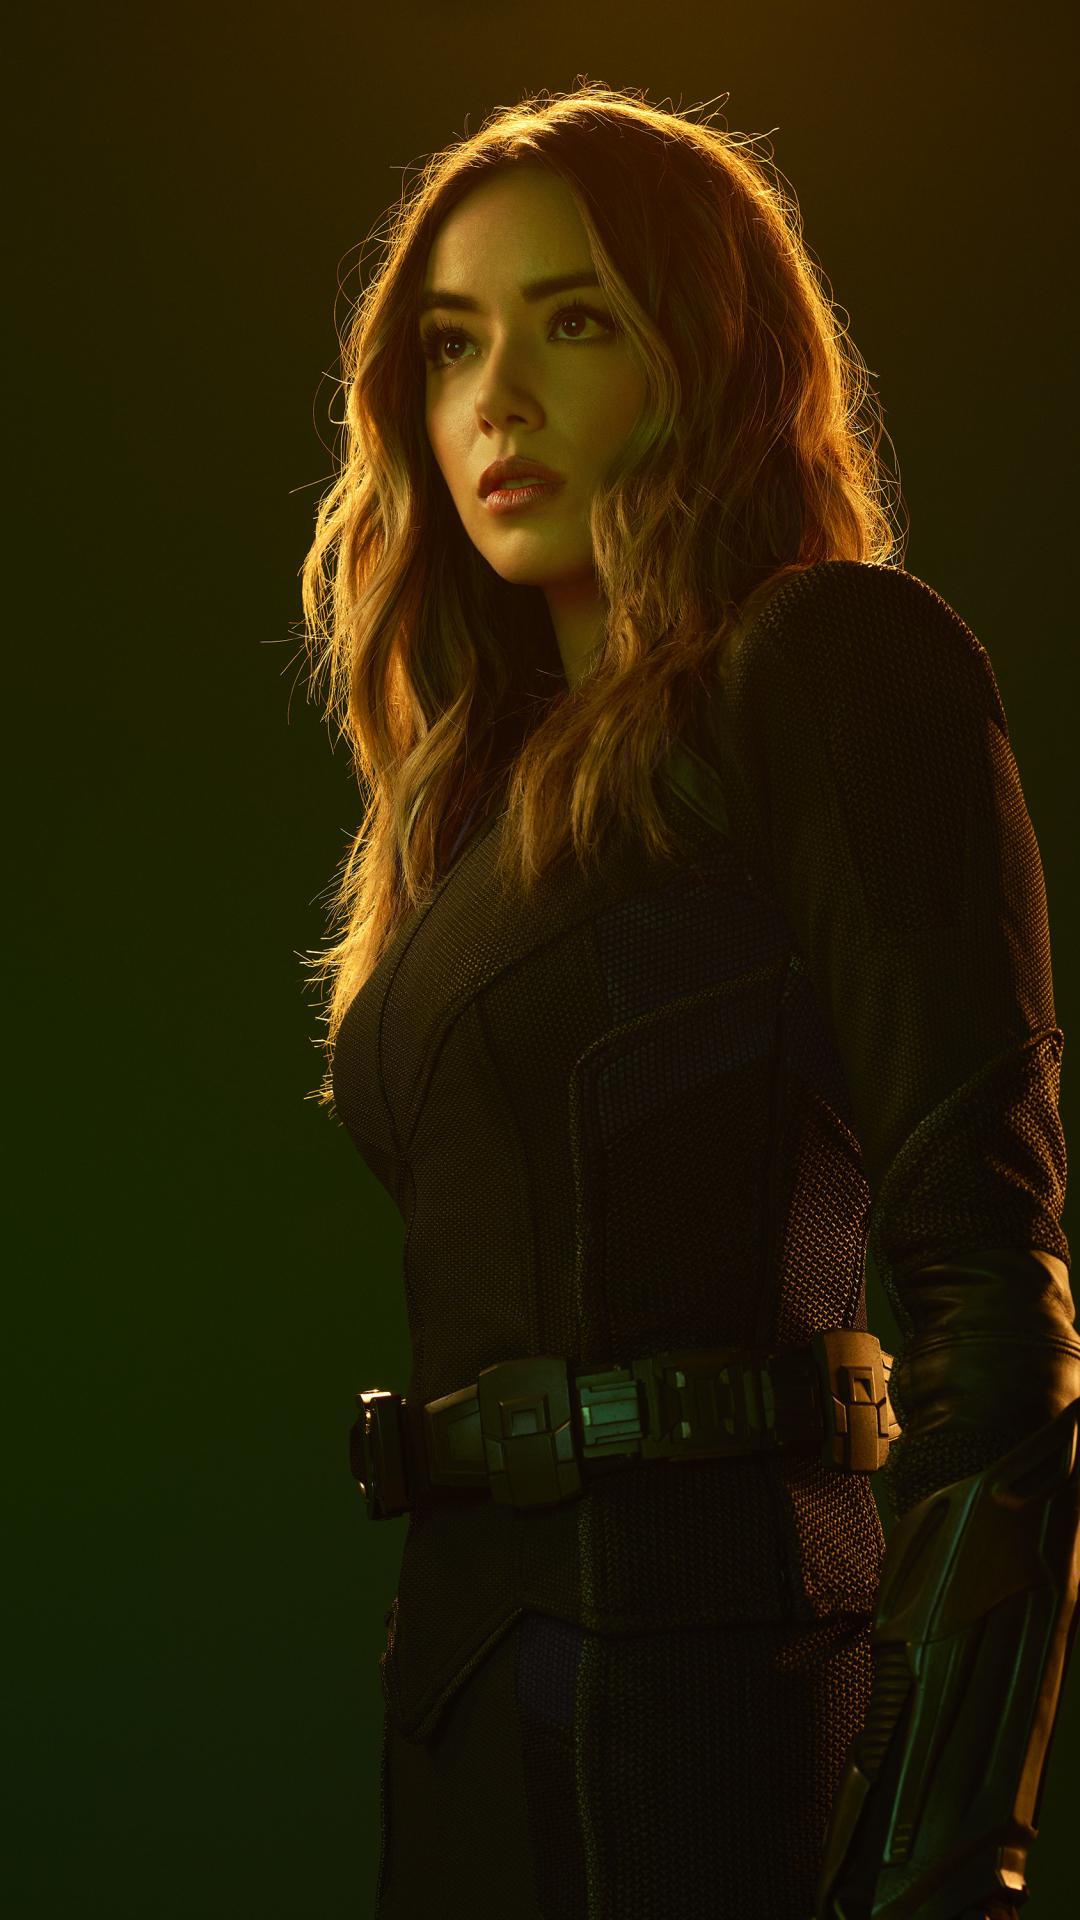 buy popular 6fe15 95603 1080x1920 Chloe Bennet Agents of SHIELD Season 6 Iphone 7 ...